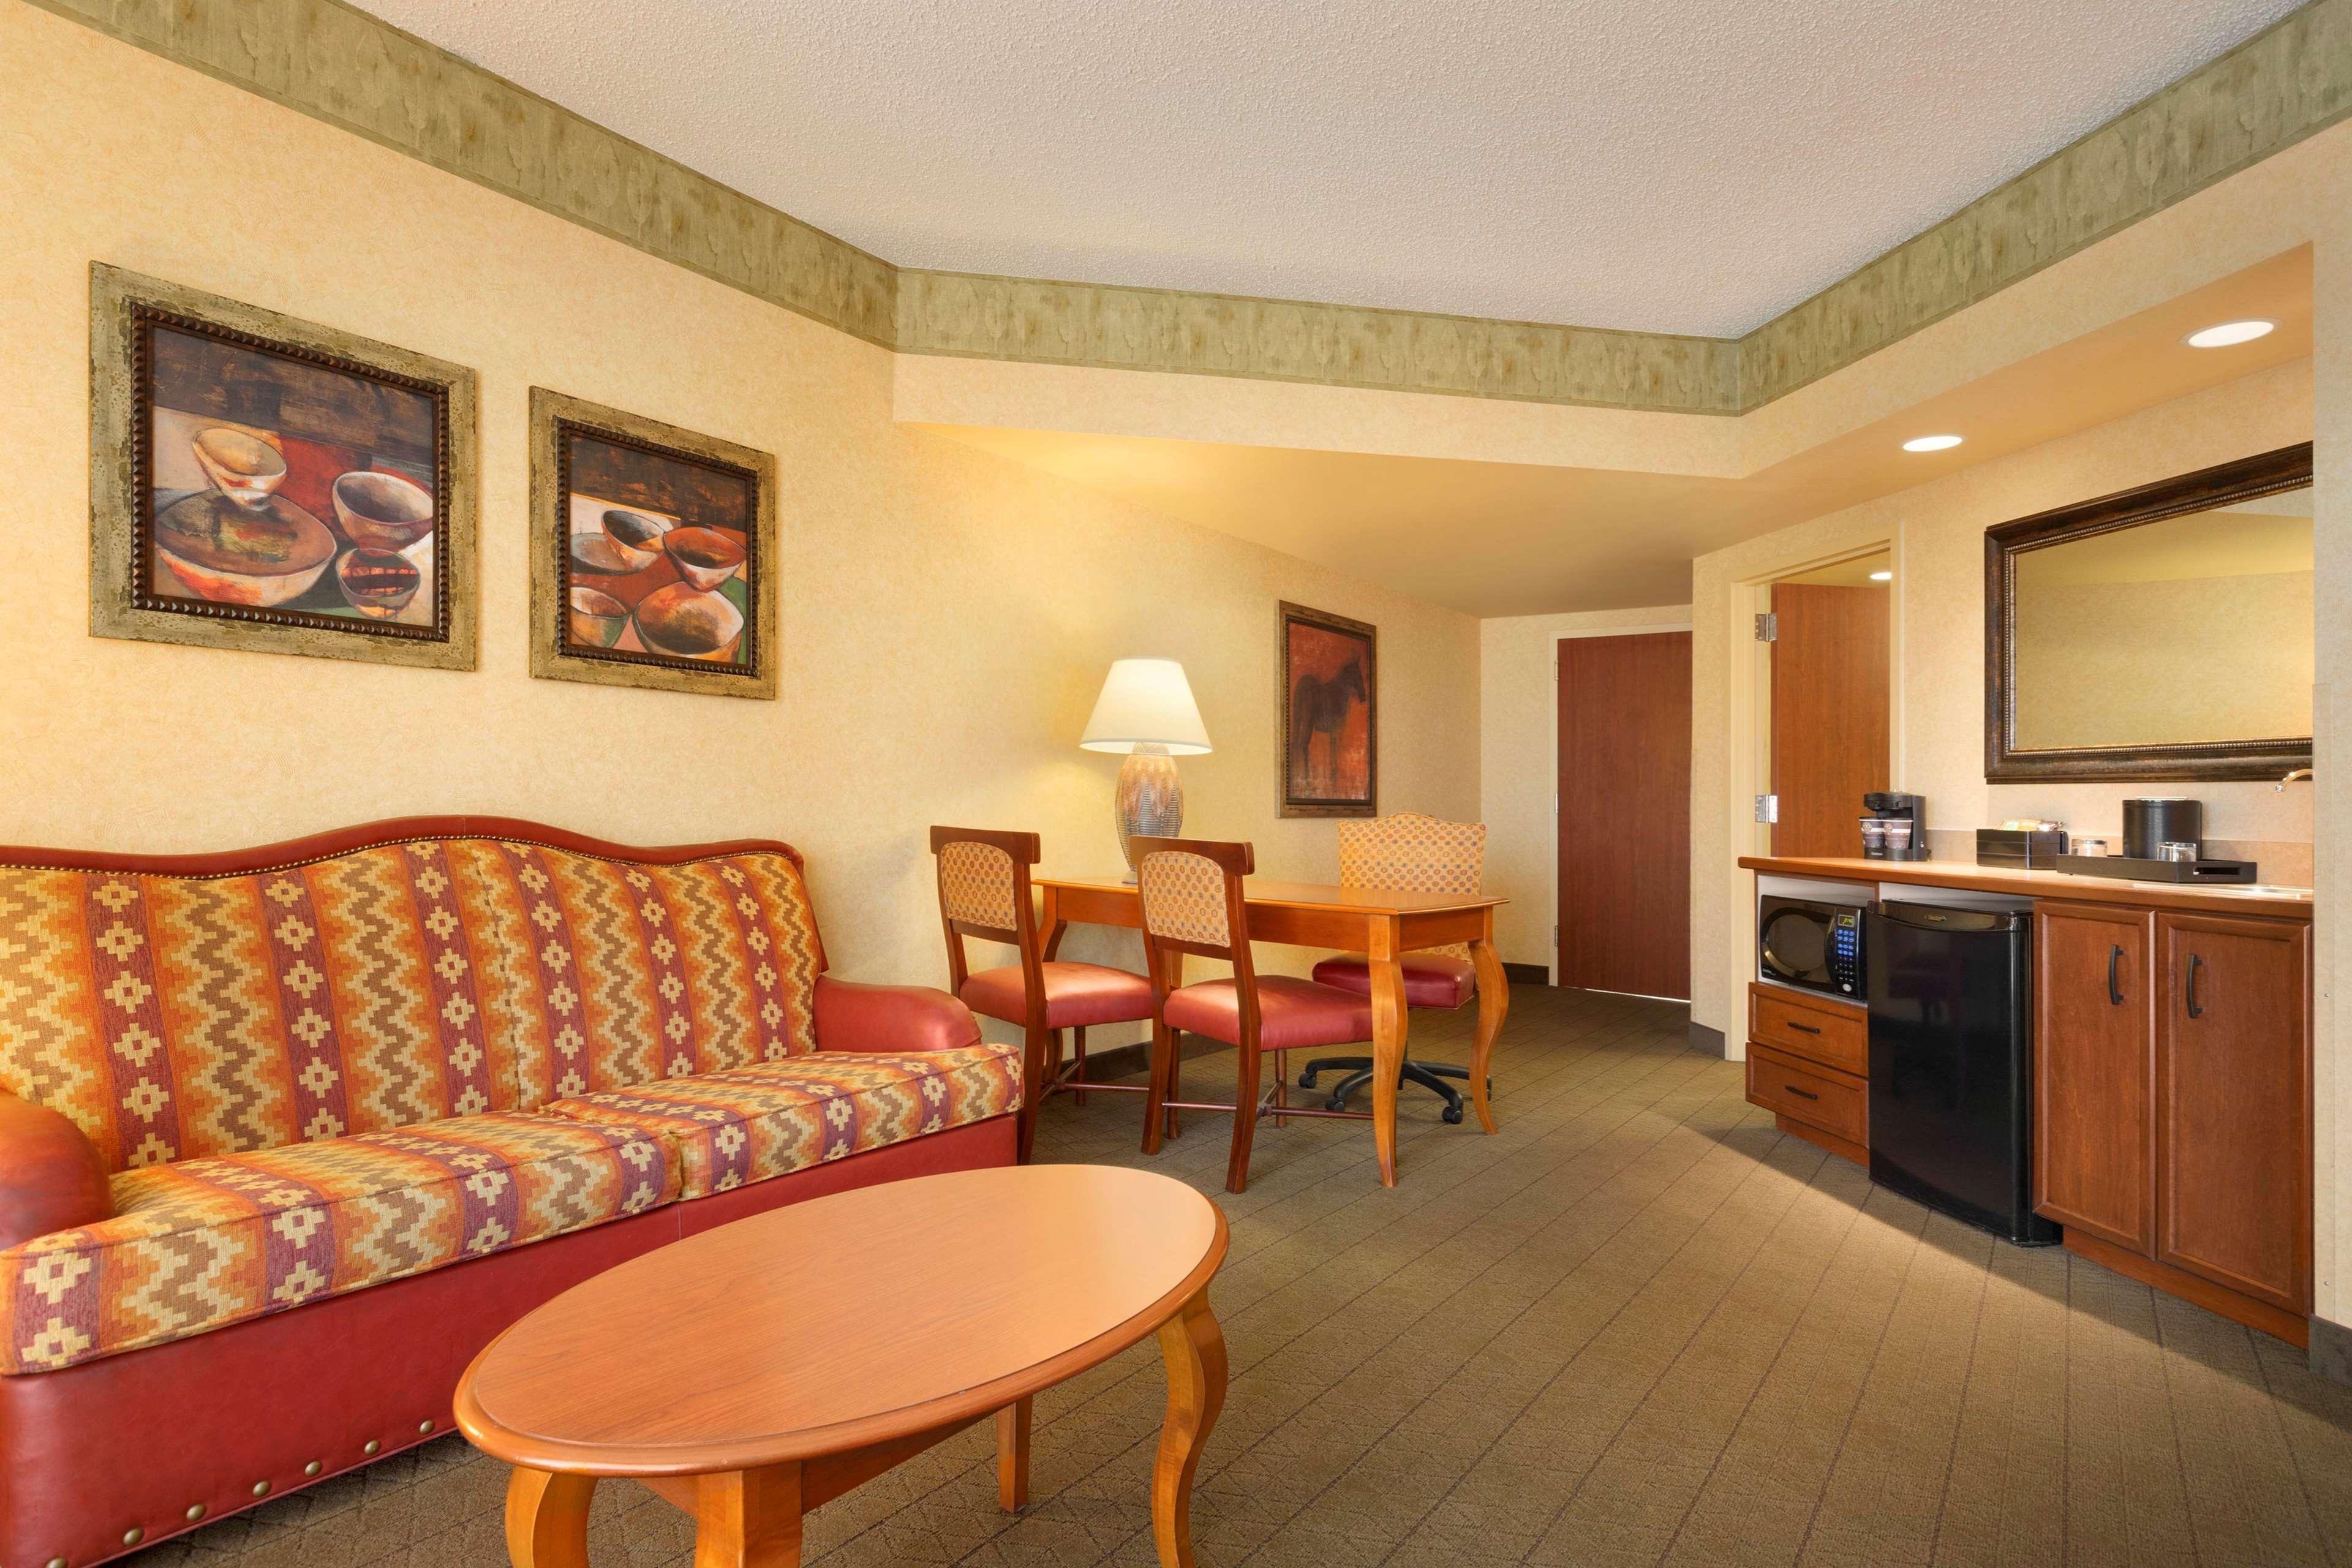 Embassy Suites by Hilton Albuquerque Hotel & Spa image 23